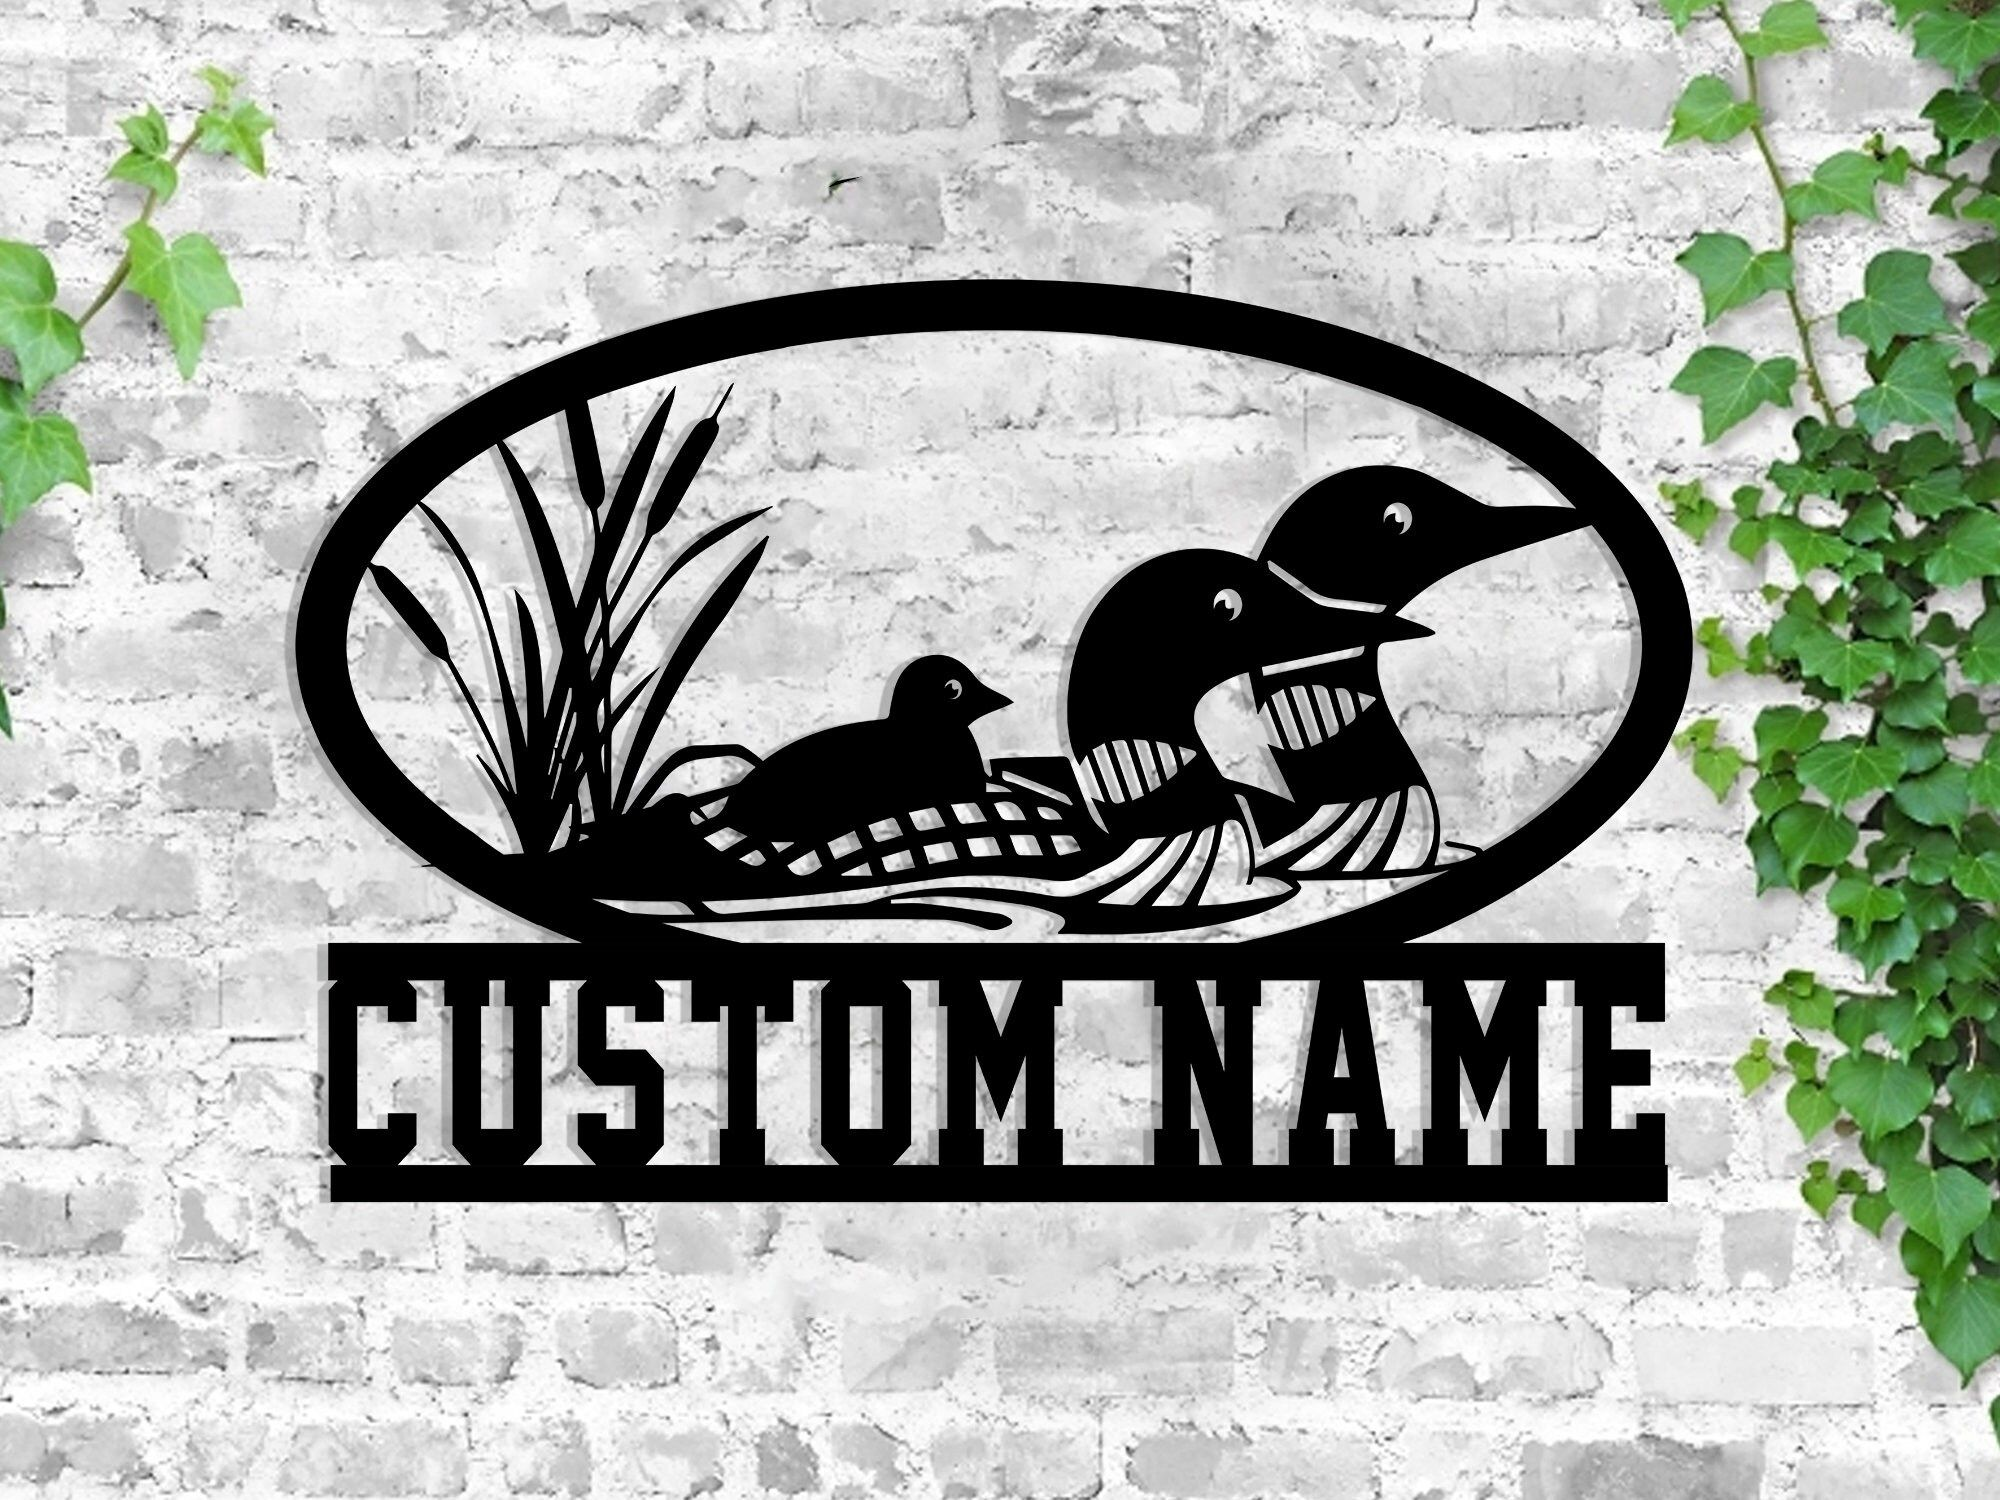 Buy 1 Get 1, Loon Metal Sign, Custom Metal Sign, Lake House Decor, Lake House Sign, Family Name Sign, Metal Wall Art, Metal Sign Custom